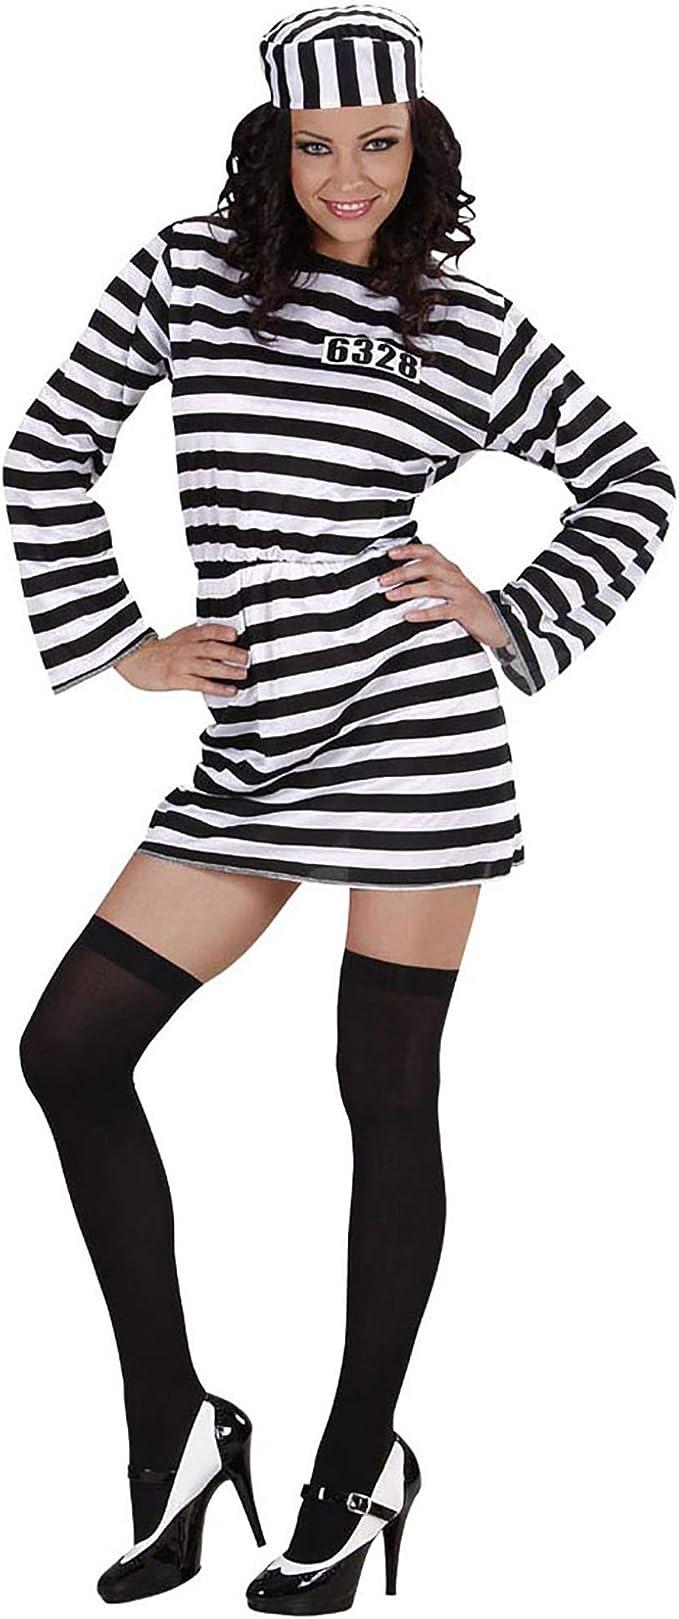 Widmann 34981 - Disfraz de presa Familia Addams Morticia para ...